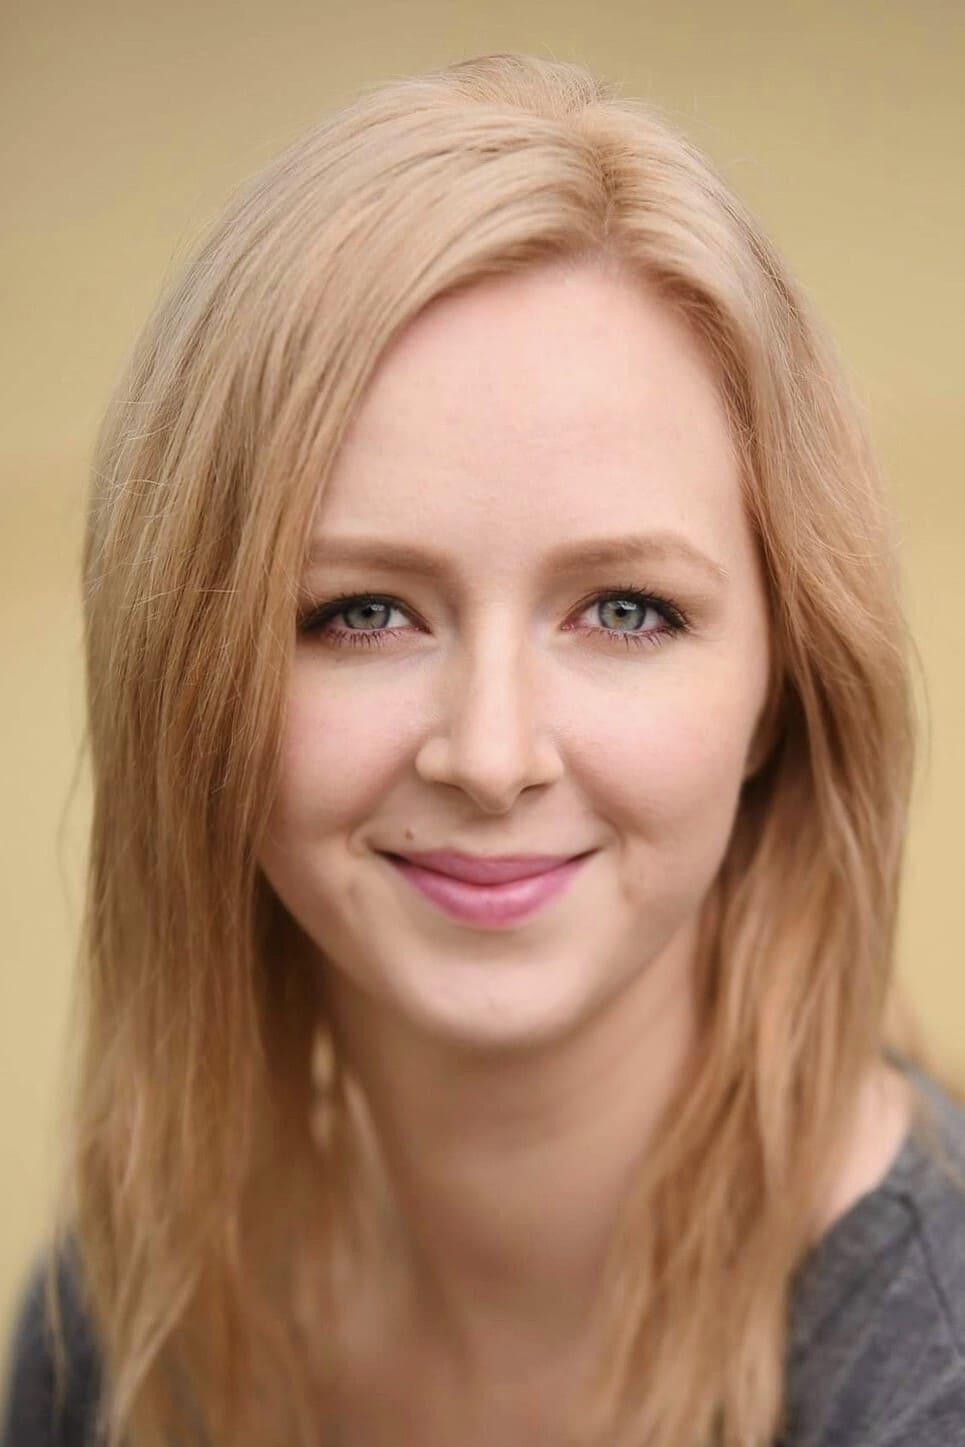 Megan Reneau